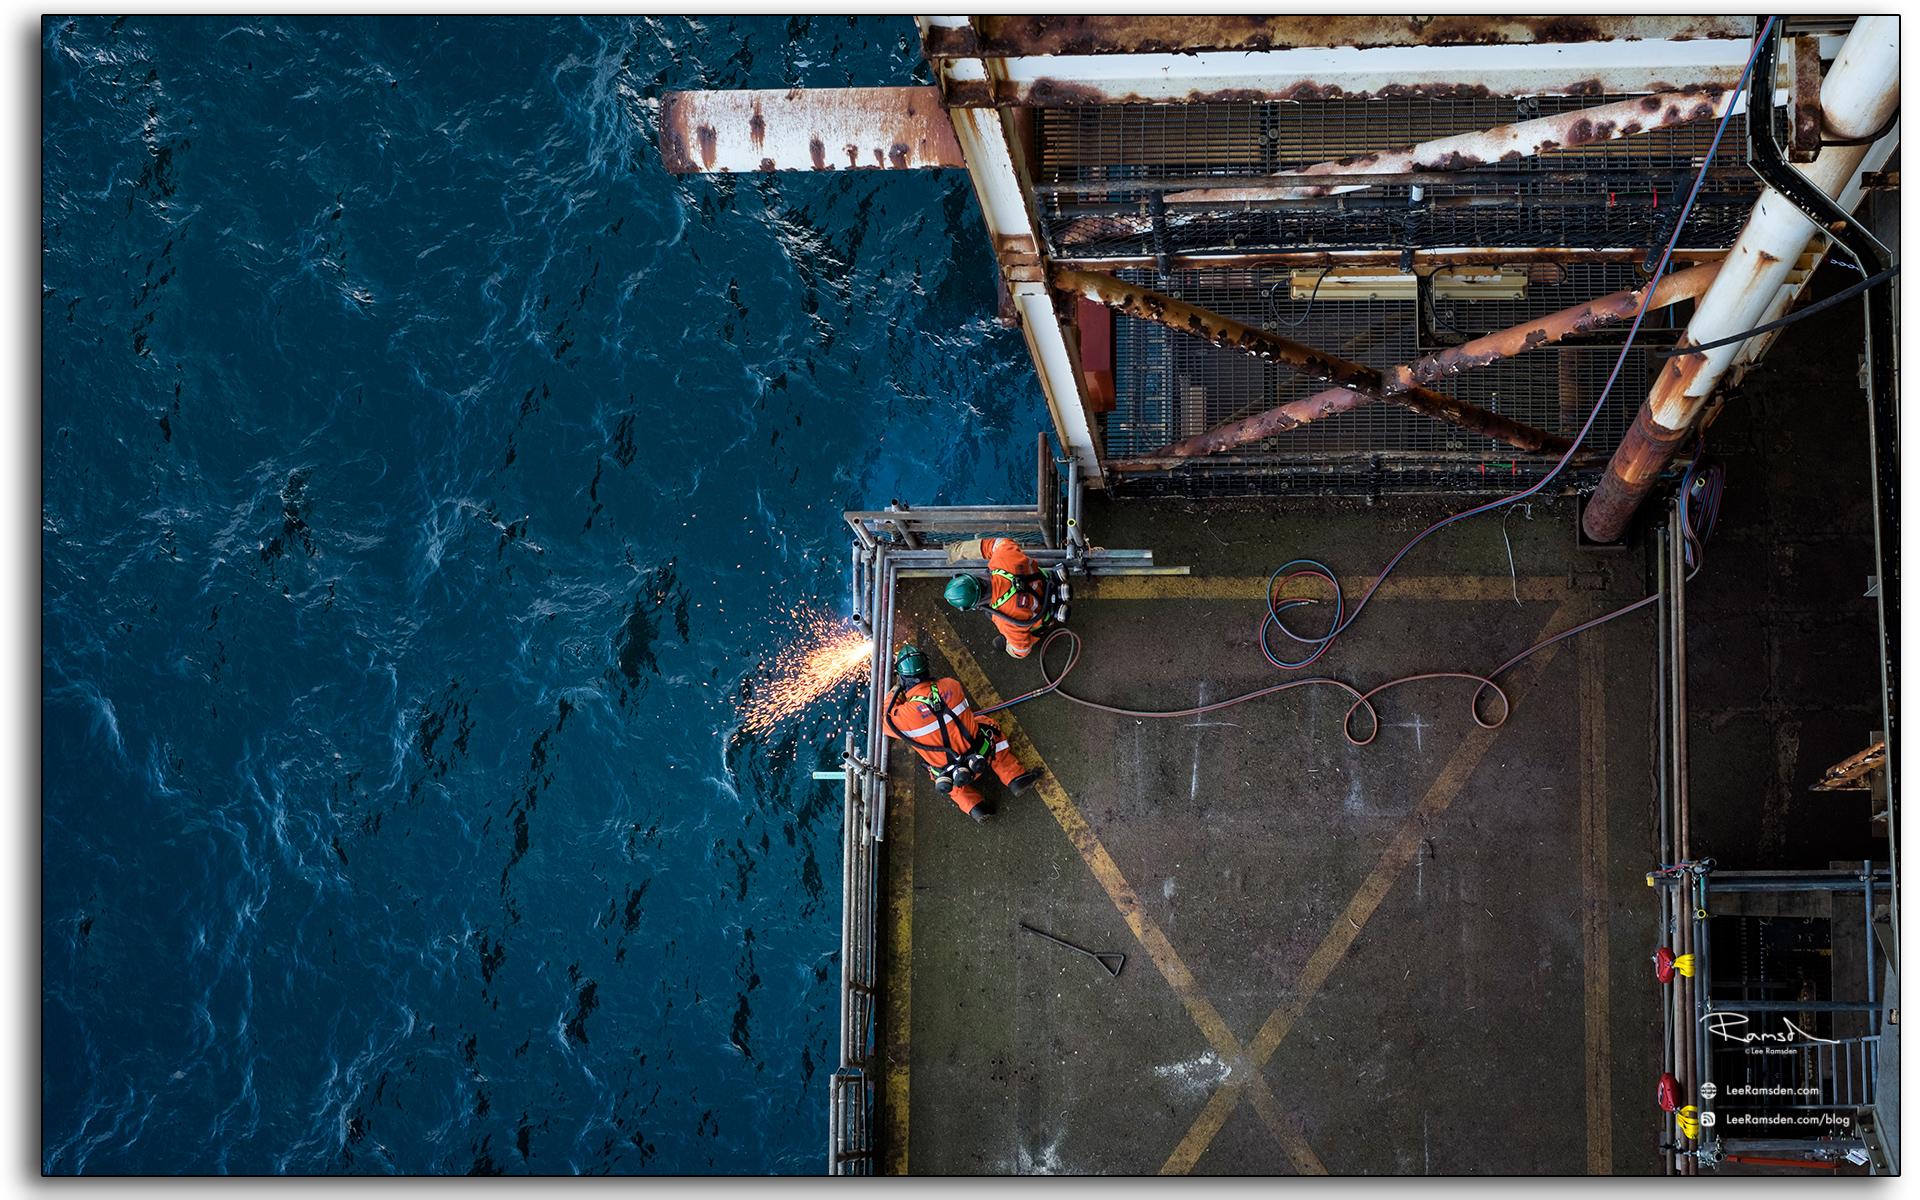 blog, Rig burning, welding, oxygen, acetylene, cutting, BP Miller, Decommissioning, industrial, removal, Saipem, Petrofac, BP, Lee Ramsden, hotwork 01